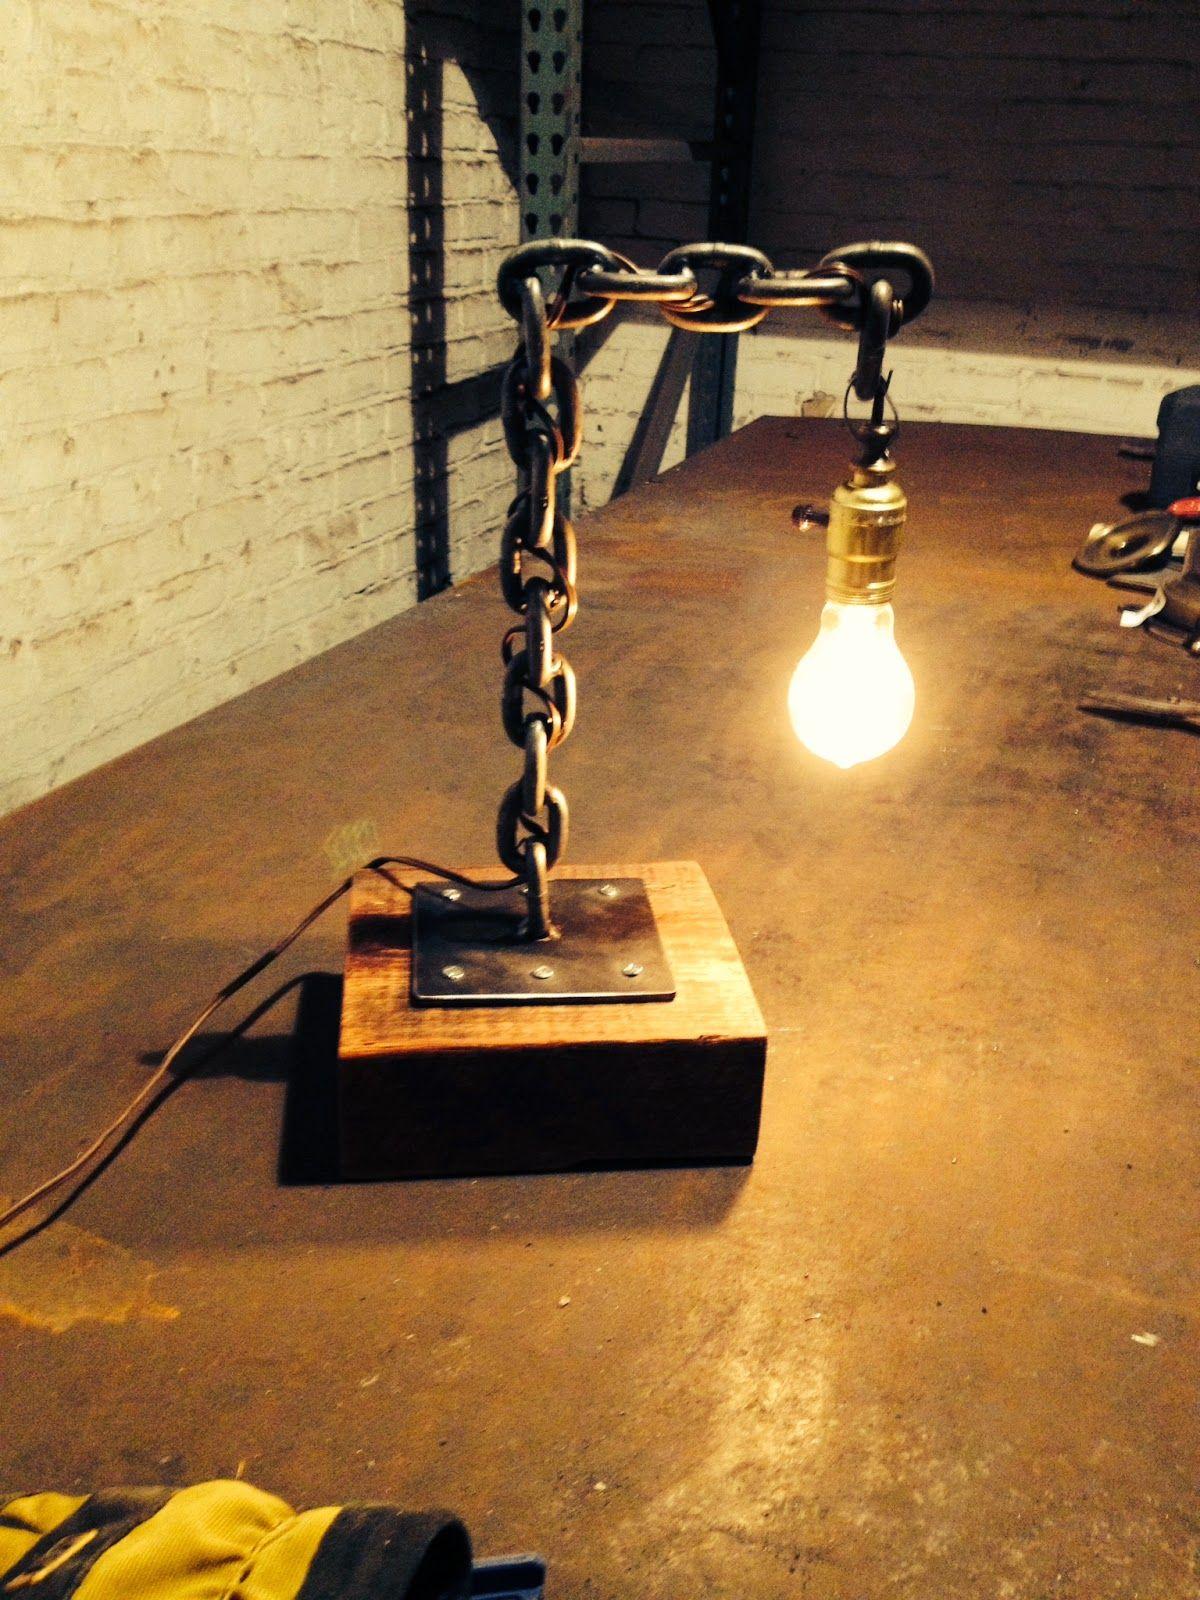 Welded Chain Desk Lamp WWWbreclaimedblogspot